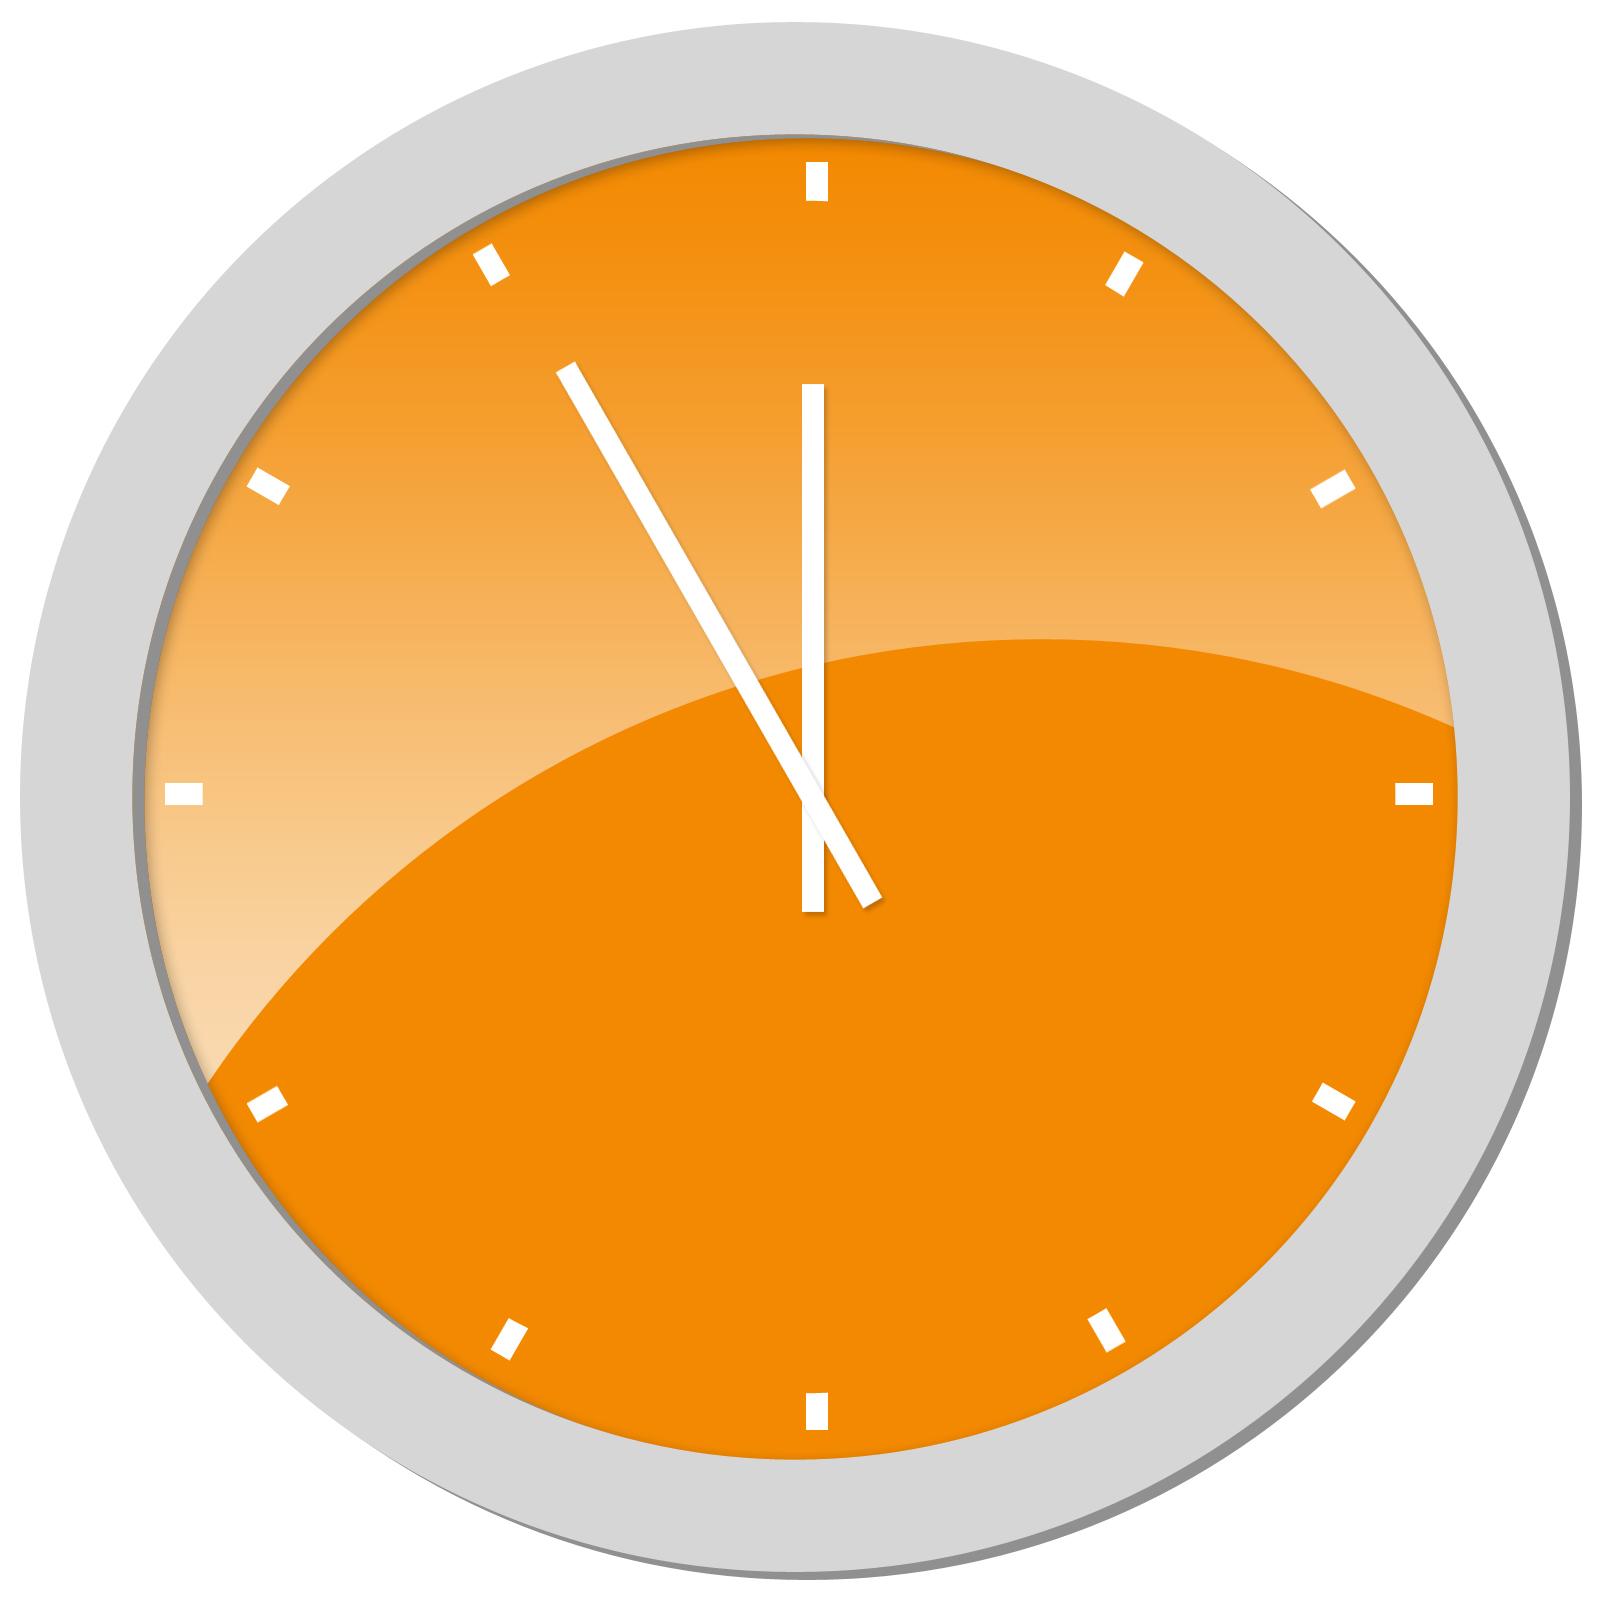 Clocks clipart orange. Free clock cliparts download